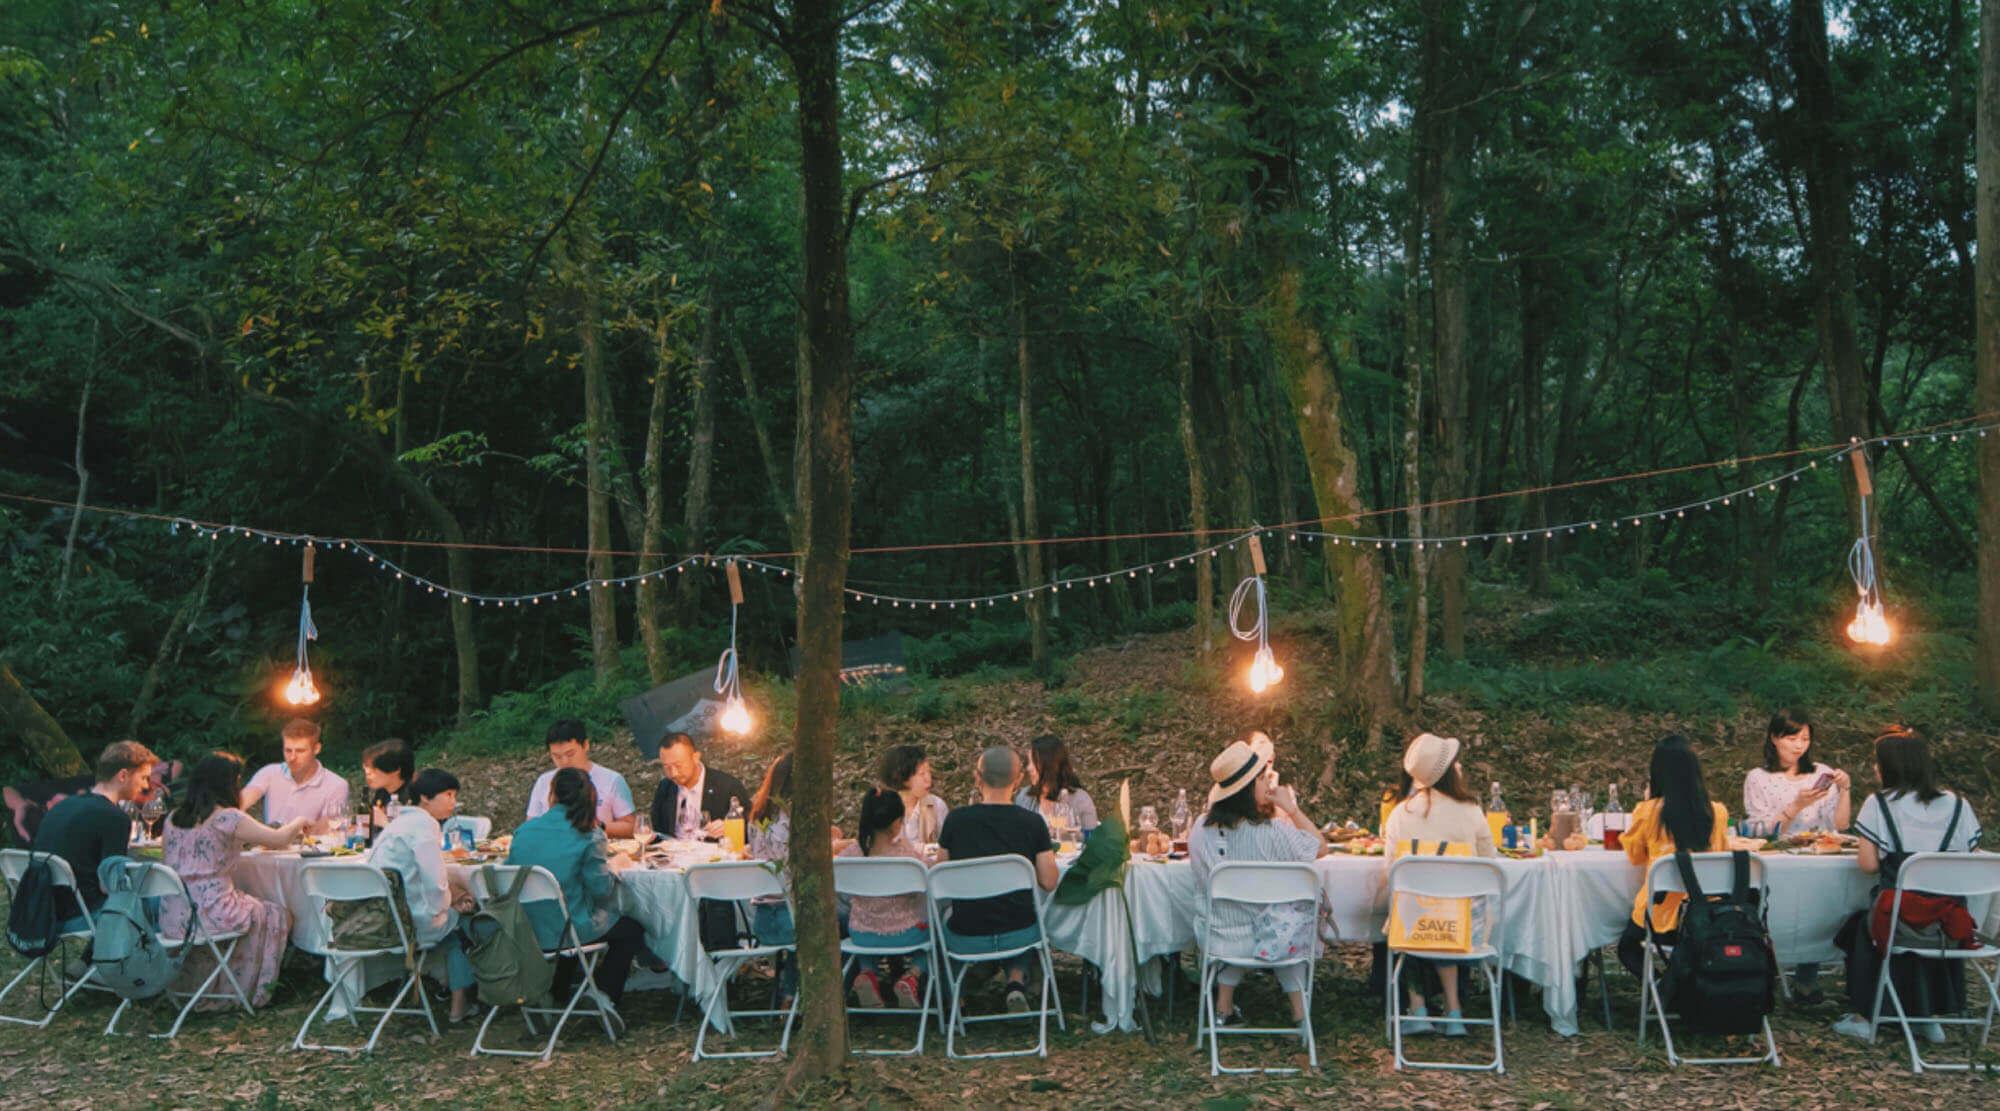 banner-outdoor-party.jpg